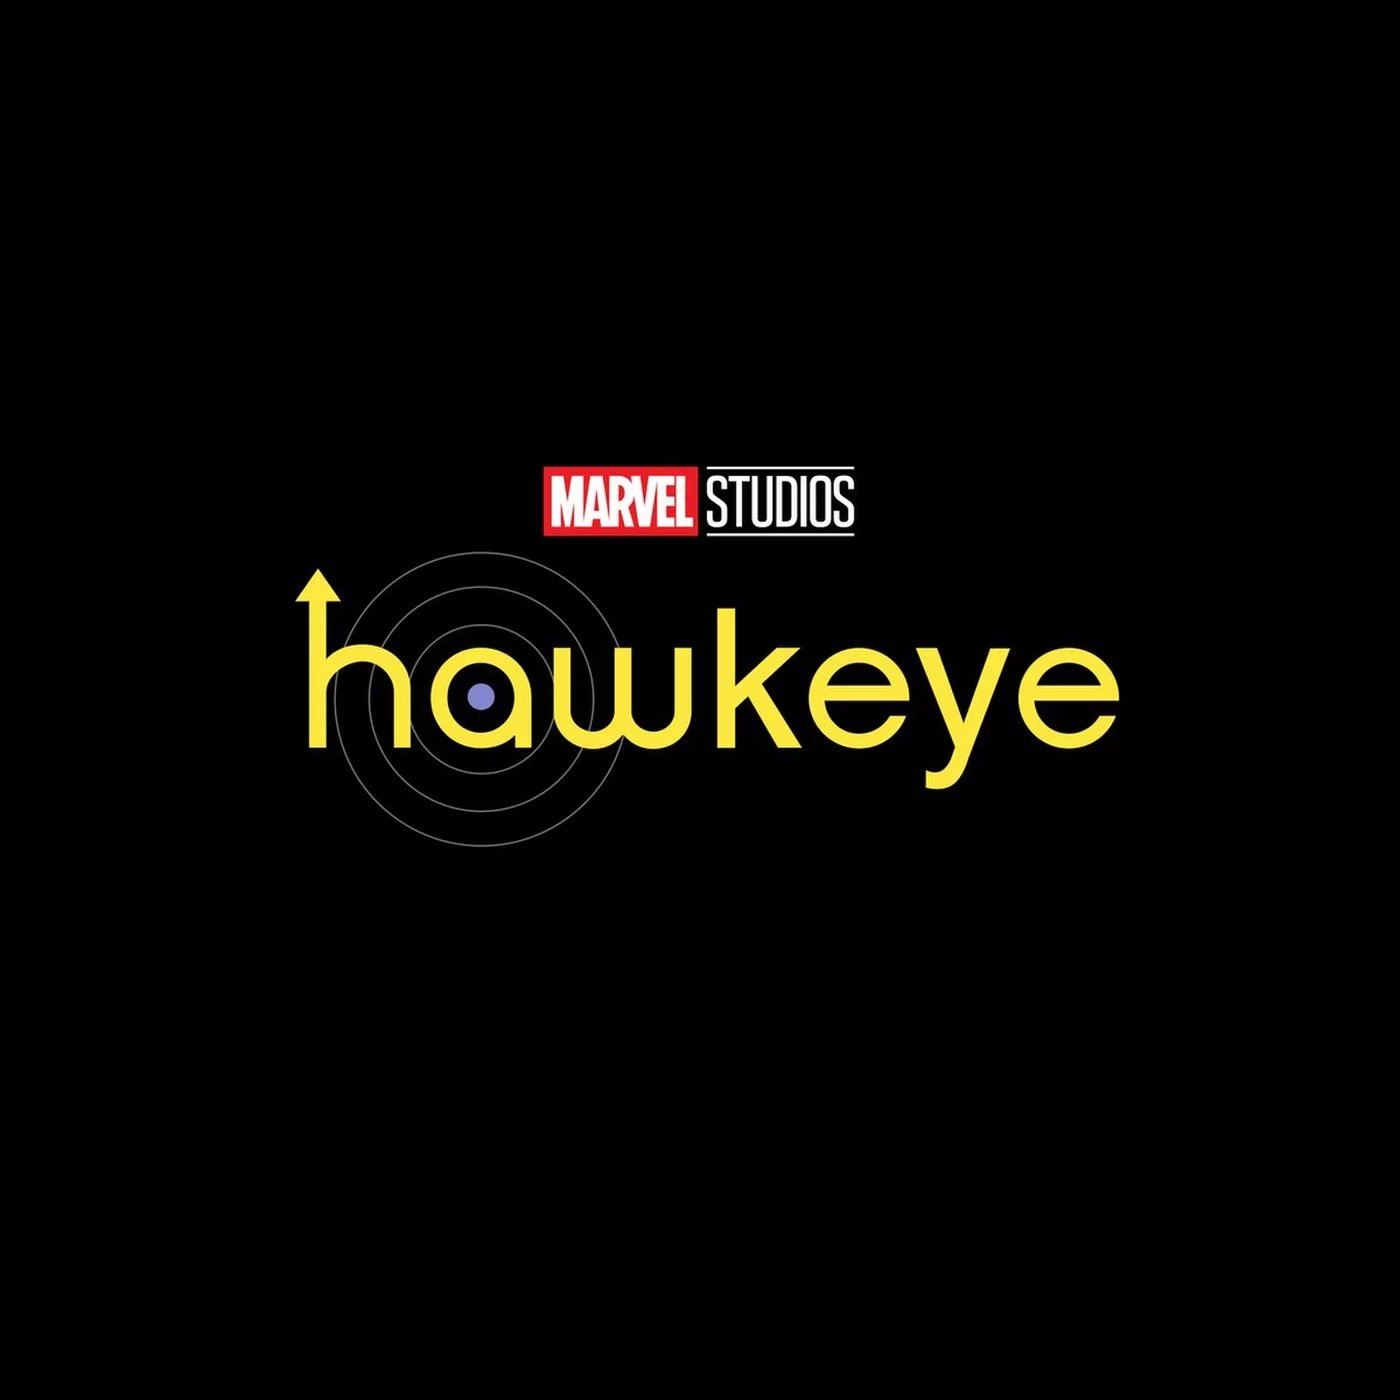 Logo Hawkeye - Giai đoạn 4 Vũ trụ Marvel - ELLE Man